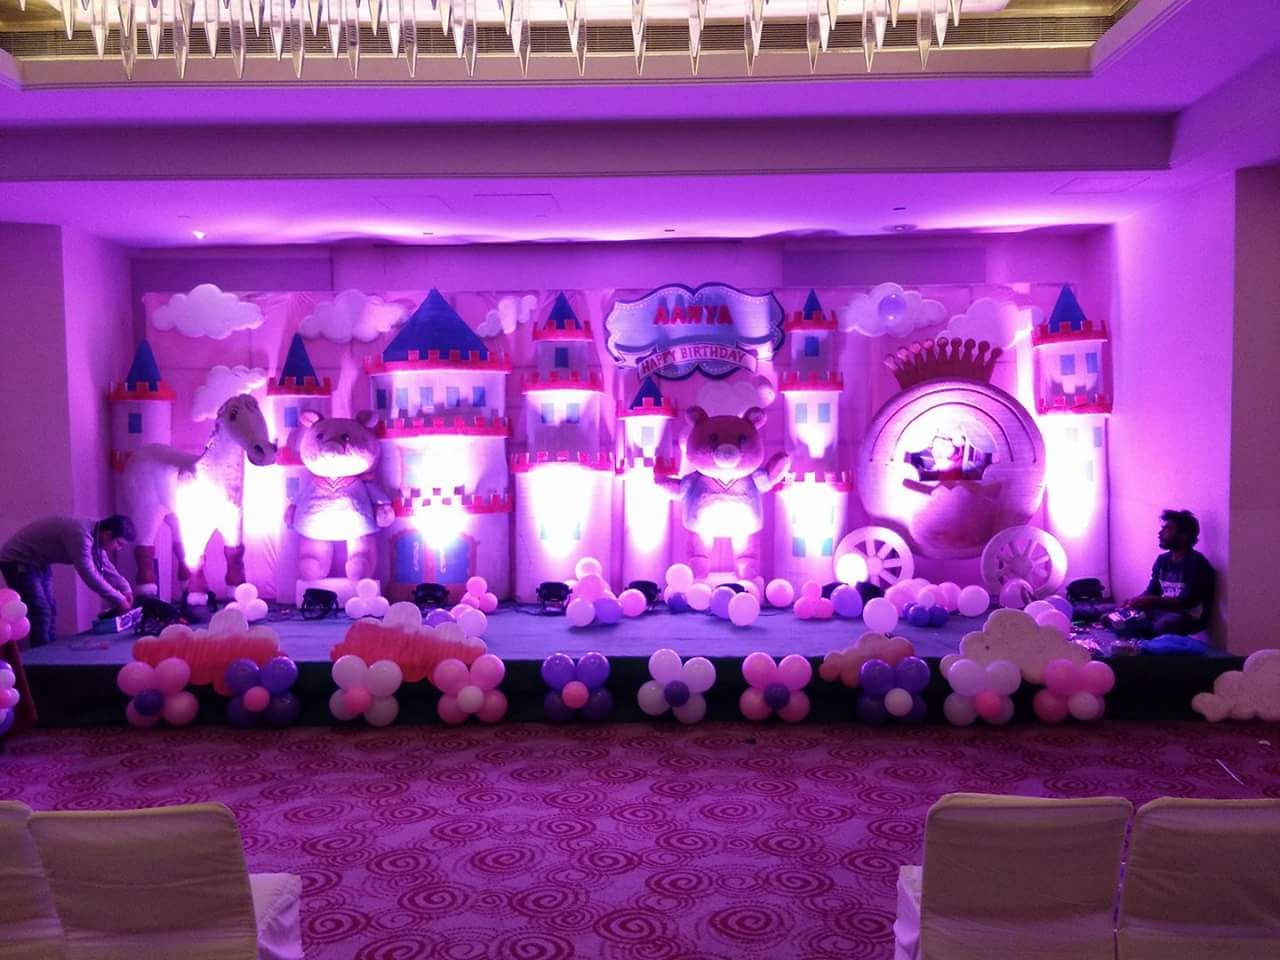 Best birthday party event organiser in hyderabad and sucunderabad best birthday party event organiser in hyderabad and sucunderabad we provide birthday decorations balloon junglespirit Choice Image